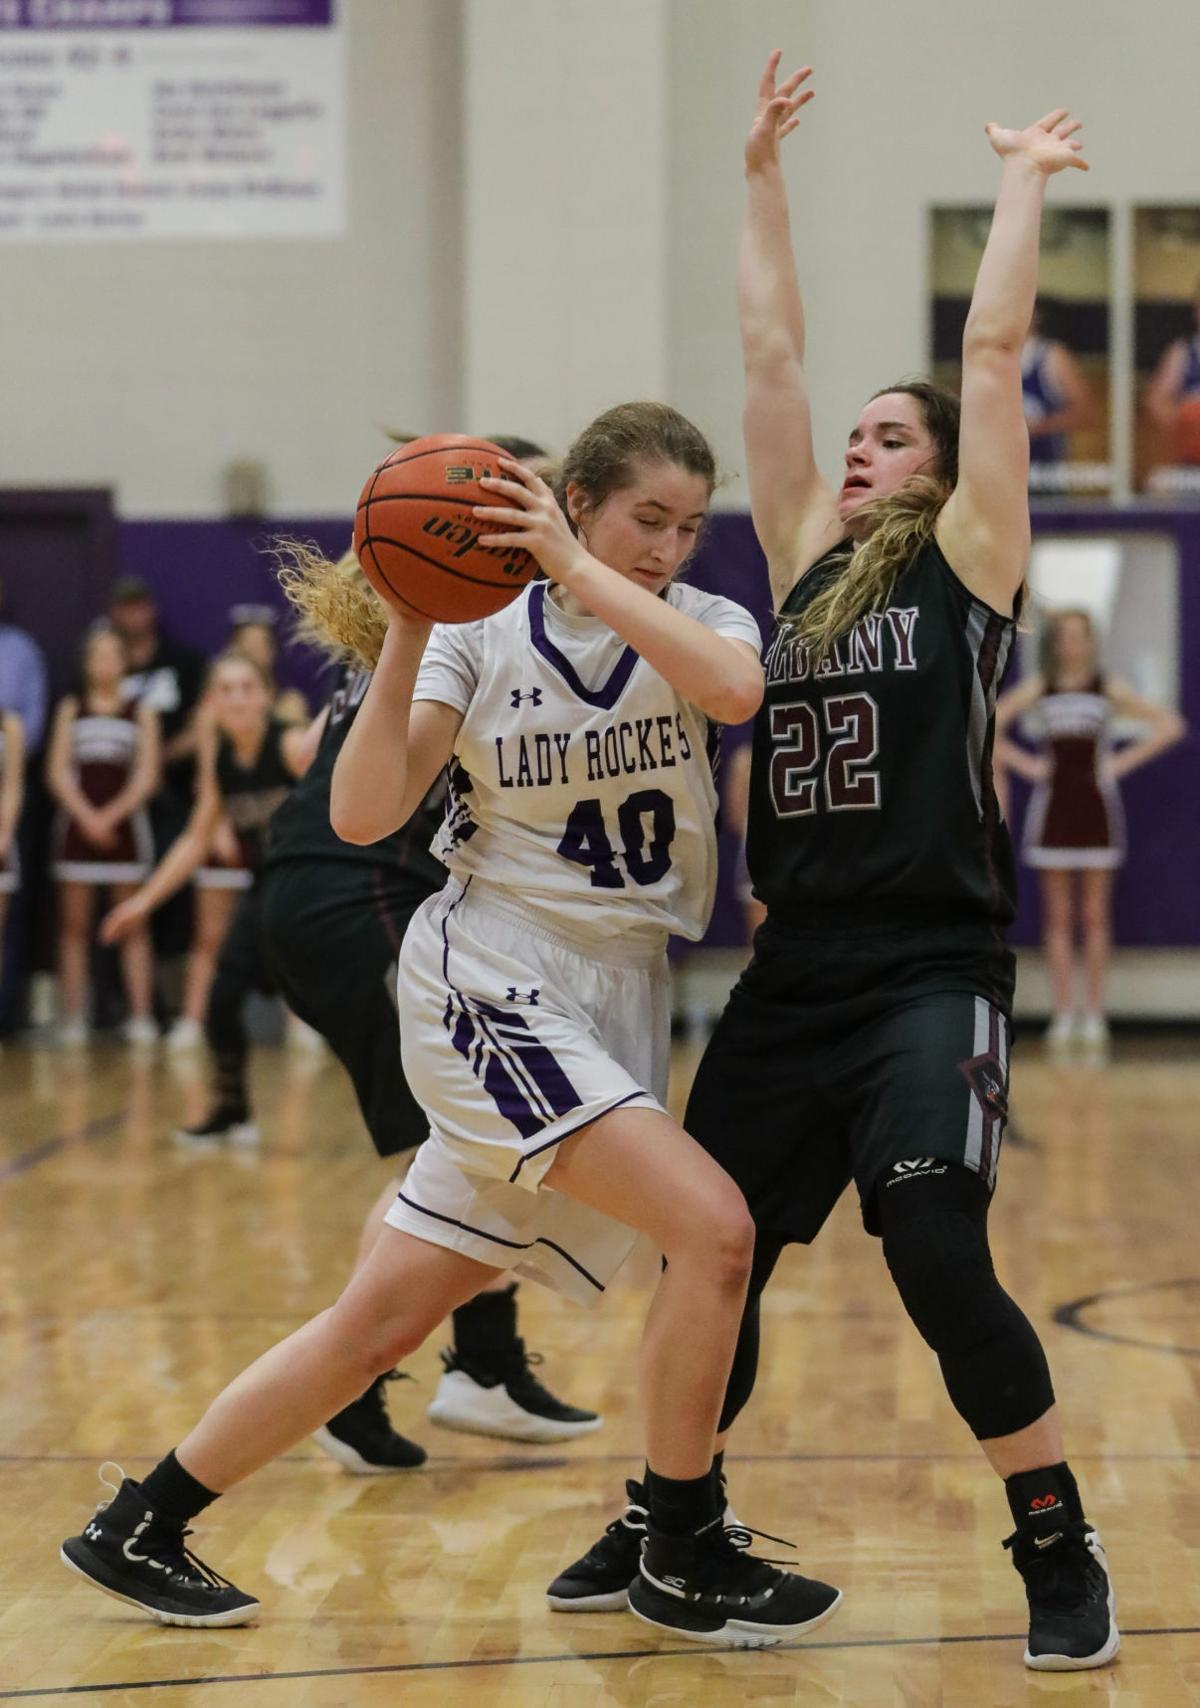 Albany at Holden girls basketball Jaycee Hughes Maddy Oubre